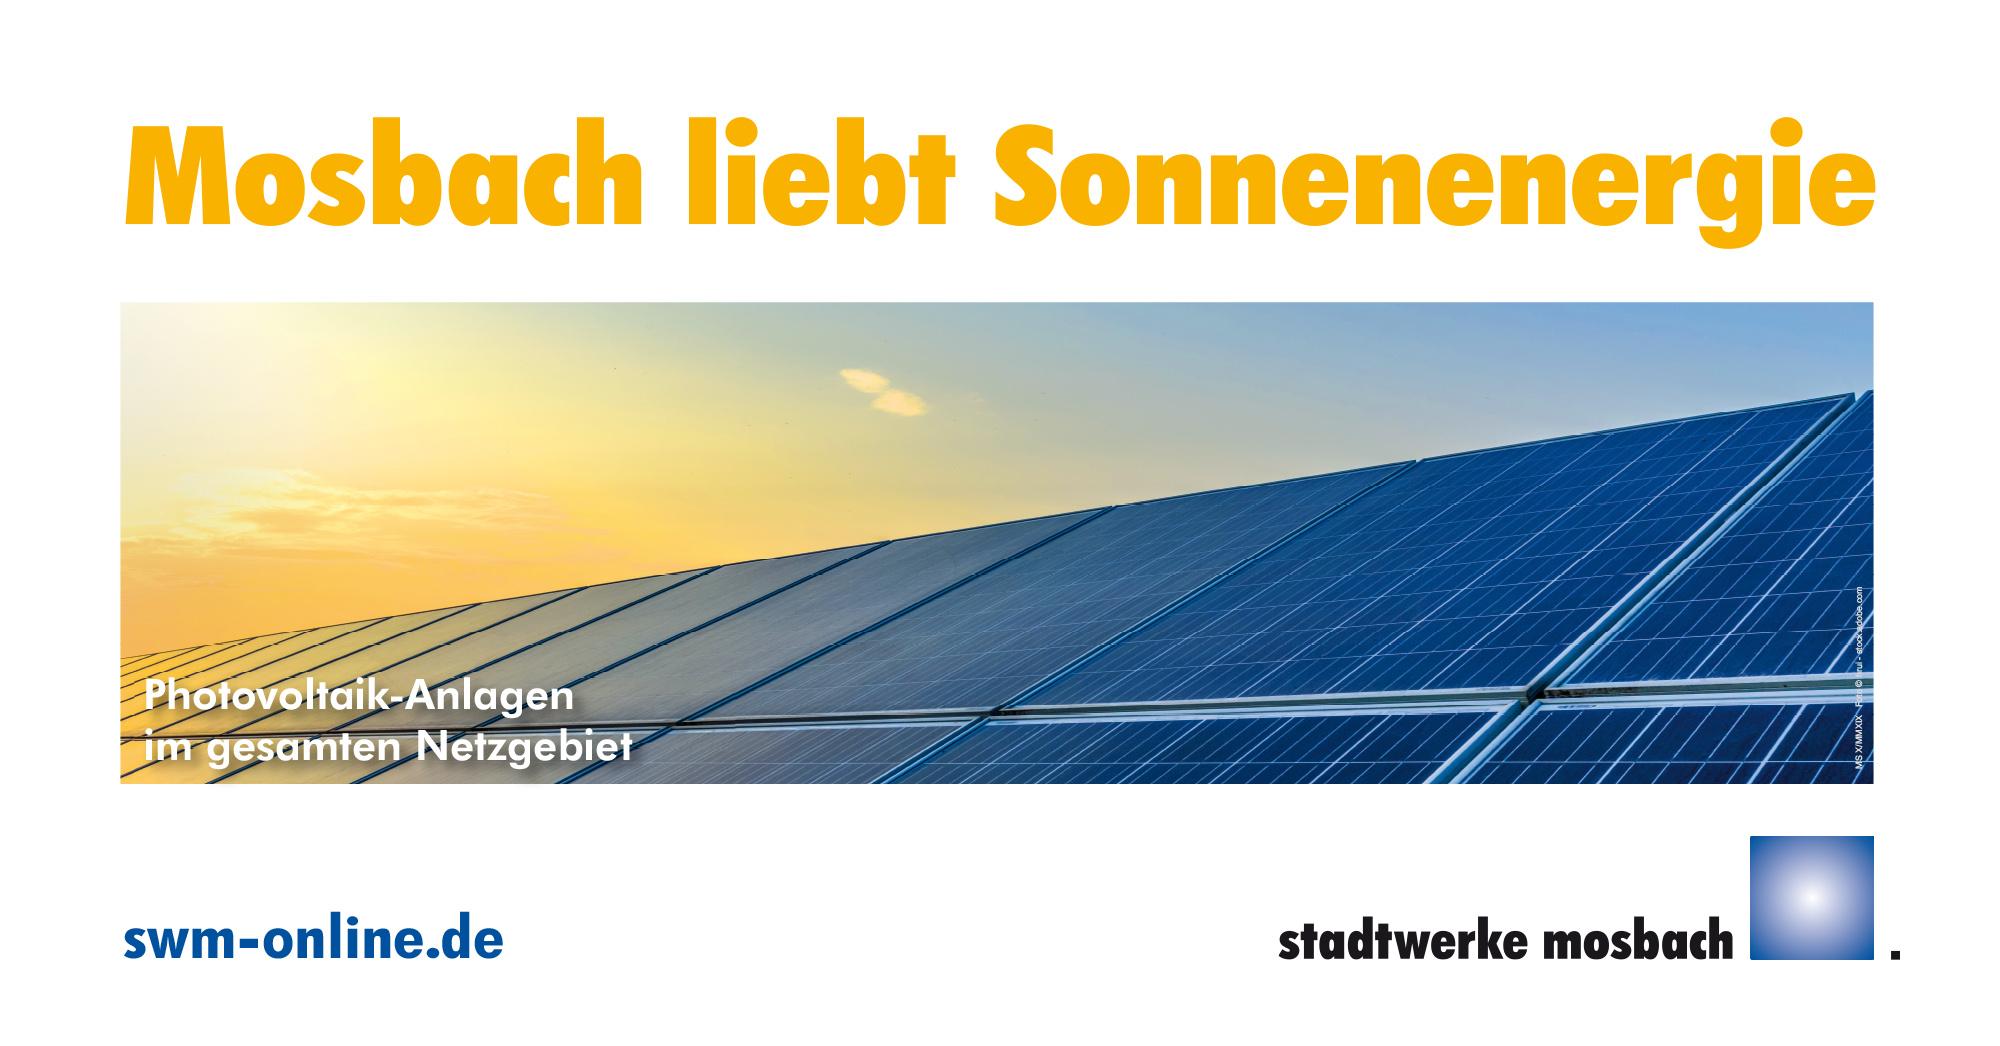 Bauzaunbanner Motiv Stadtwerke Mosbach Photovoltaik